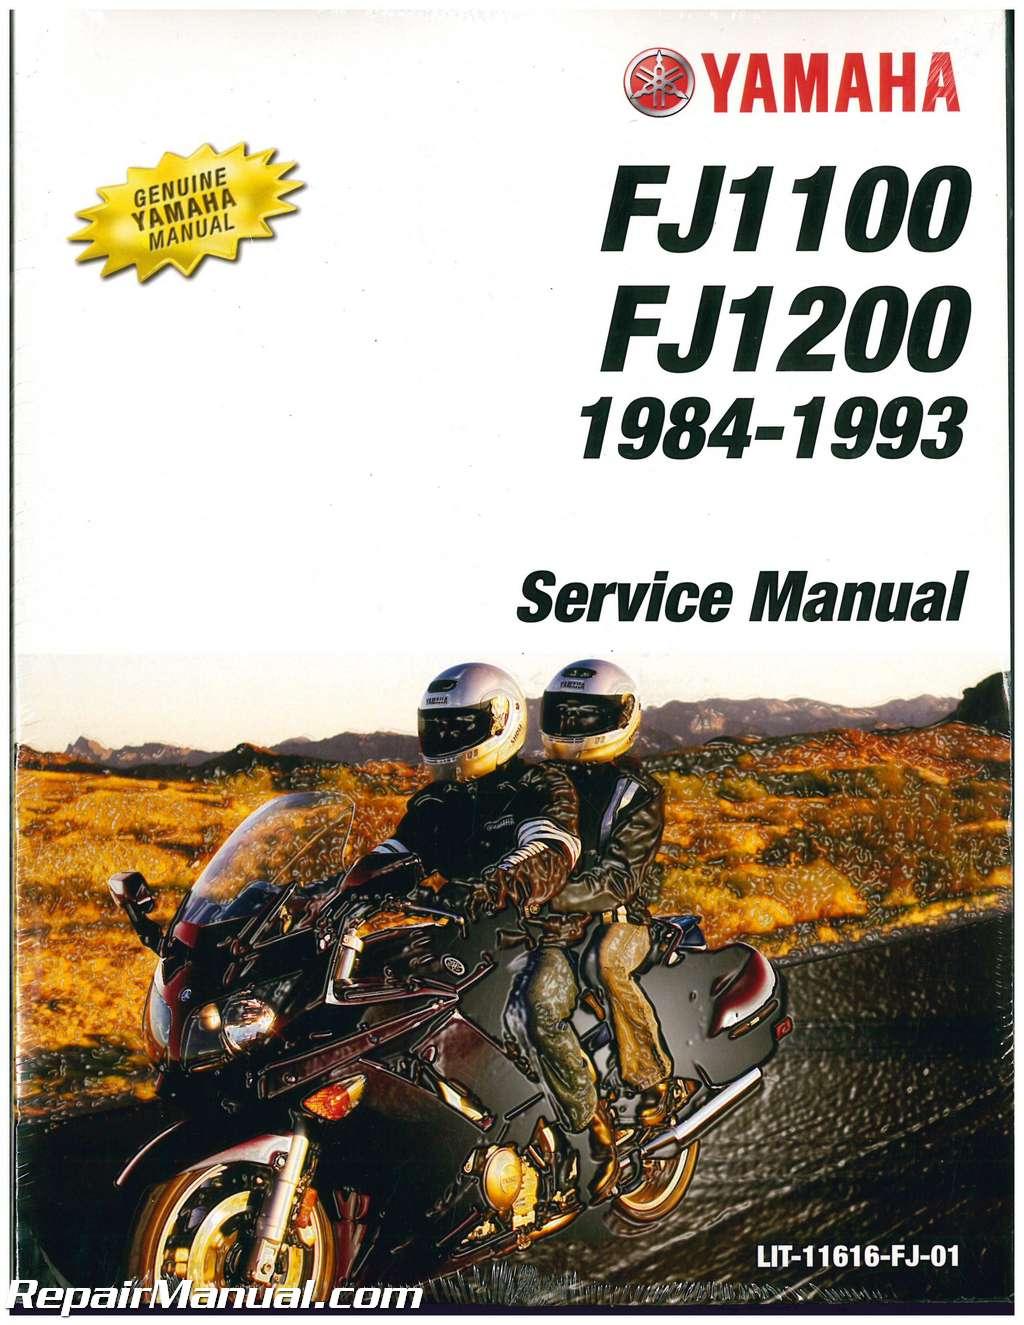 fj1100 service manual